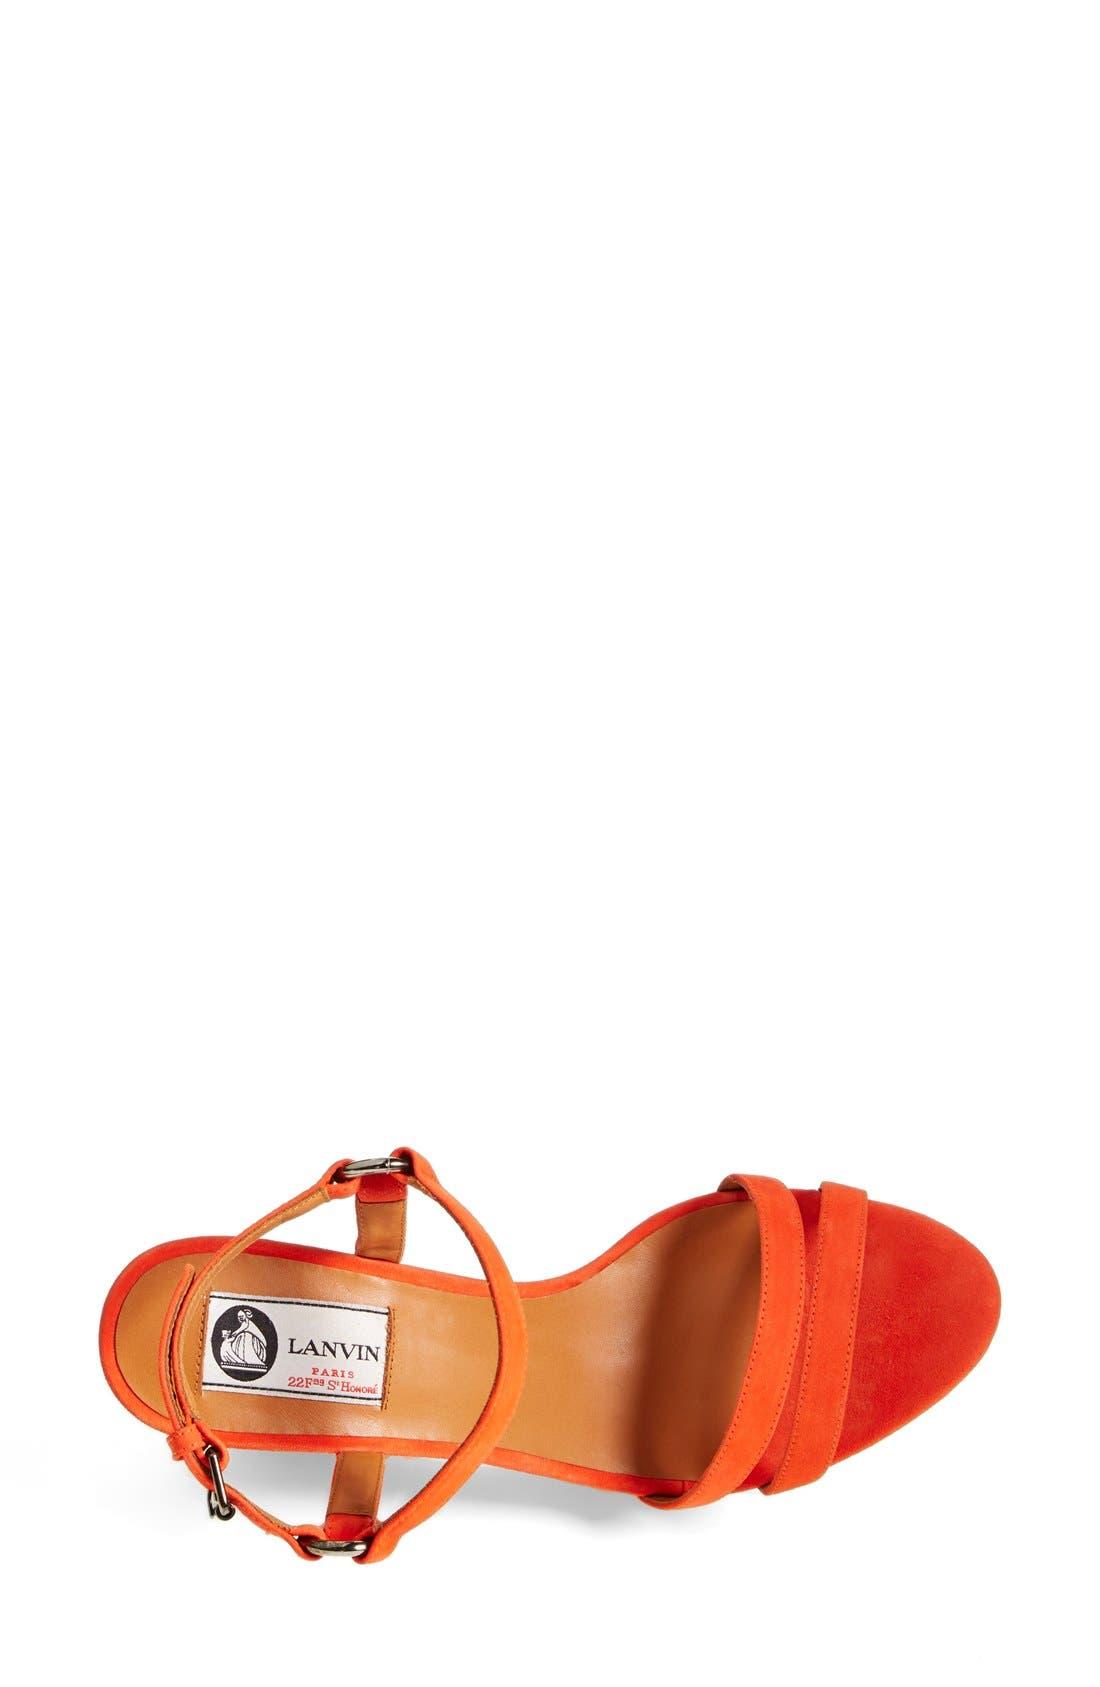 LANVIN, Espadrille Wedge Sandal, Alternate thumbnail 3, color, 800